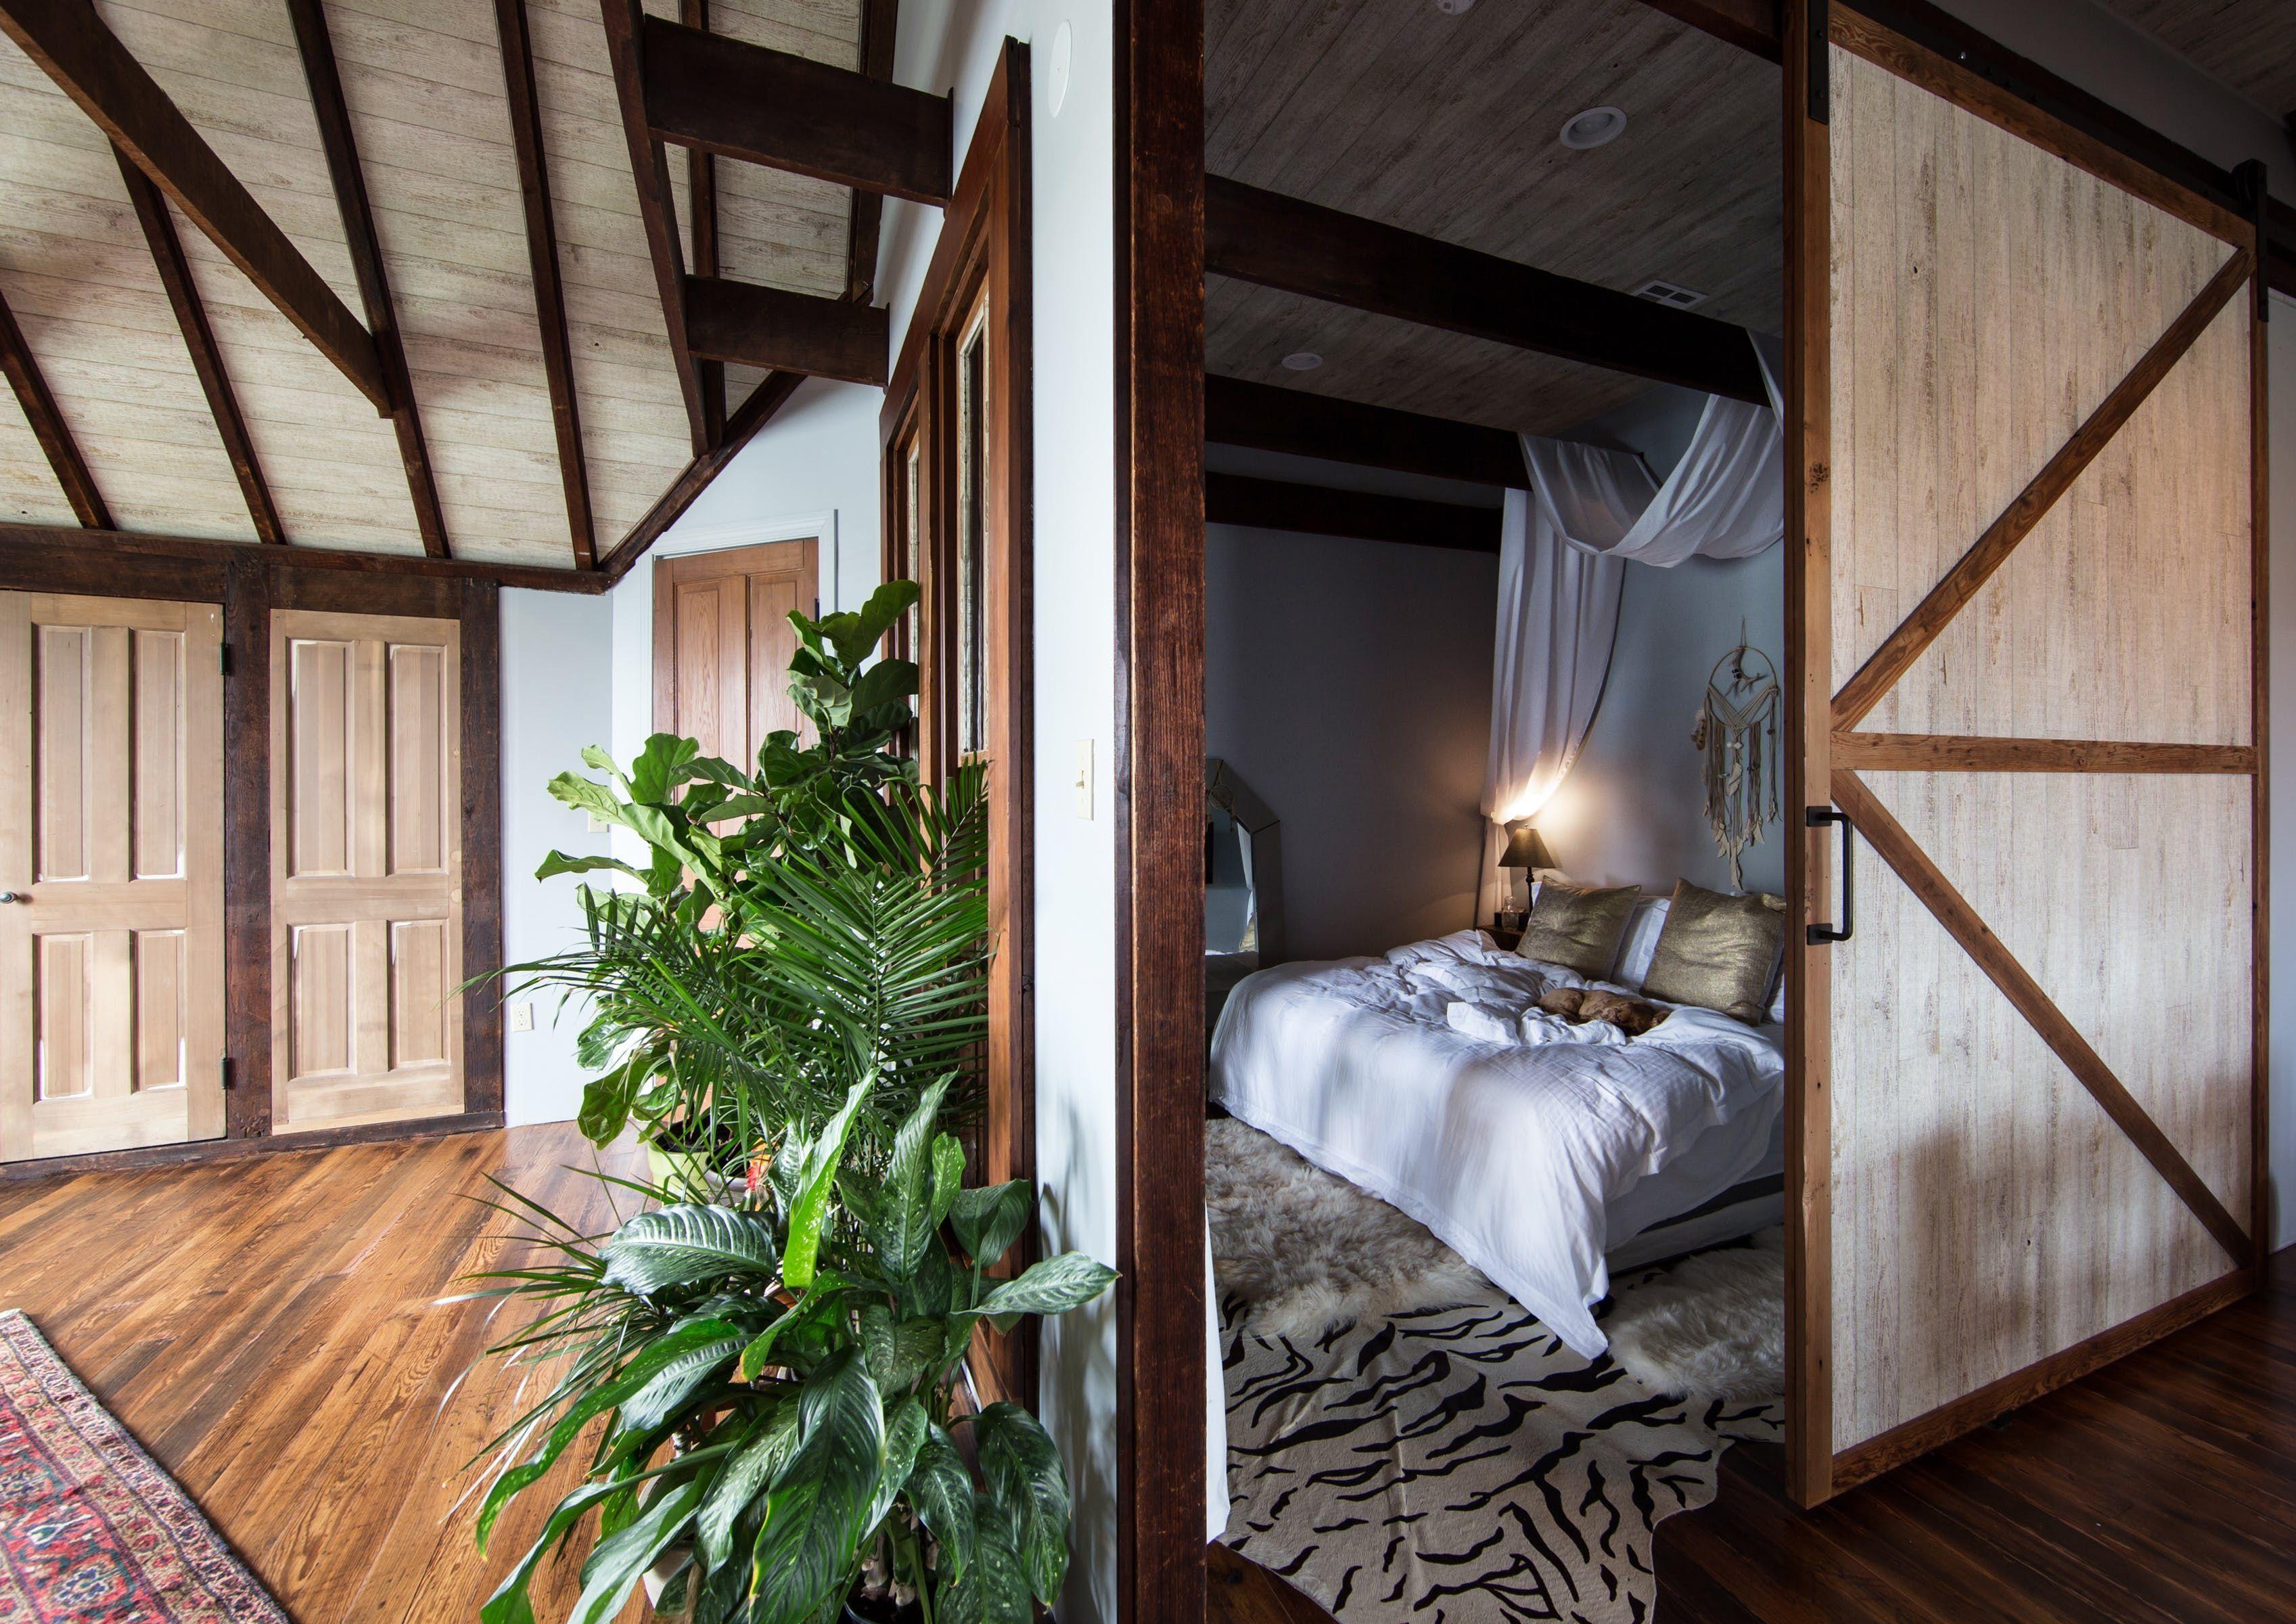 Melindaus bedroom is tucked away behind a sliding barn door and a